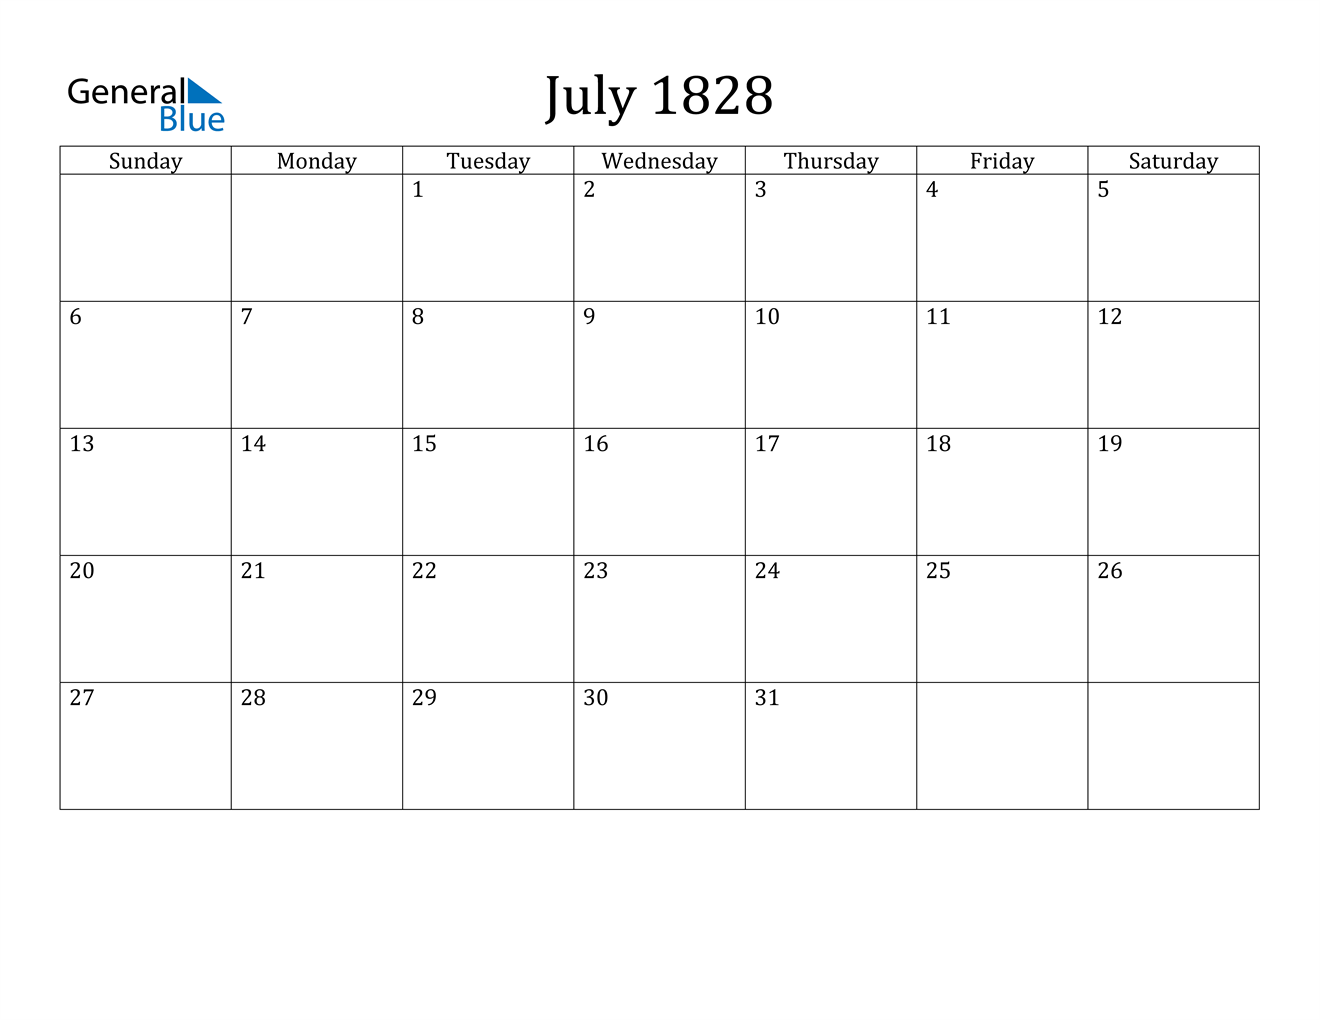 Image of July 1828 Calendar